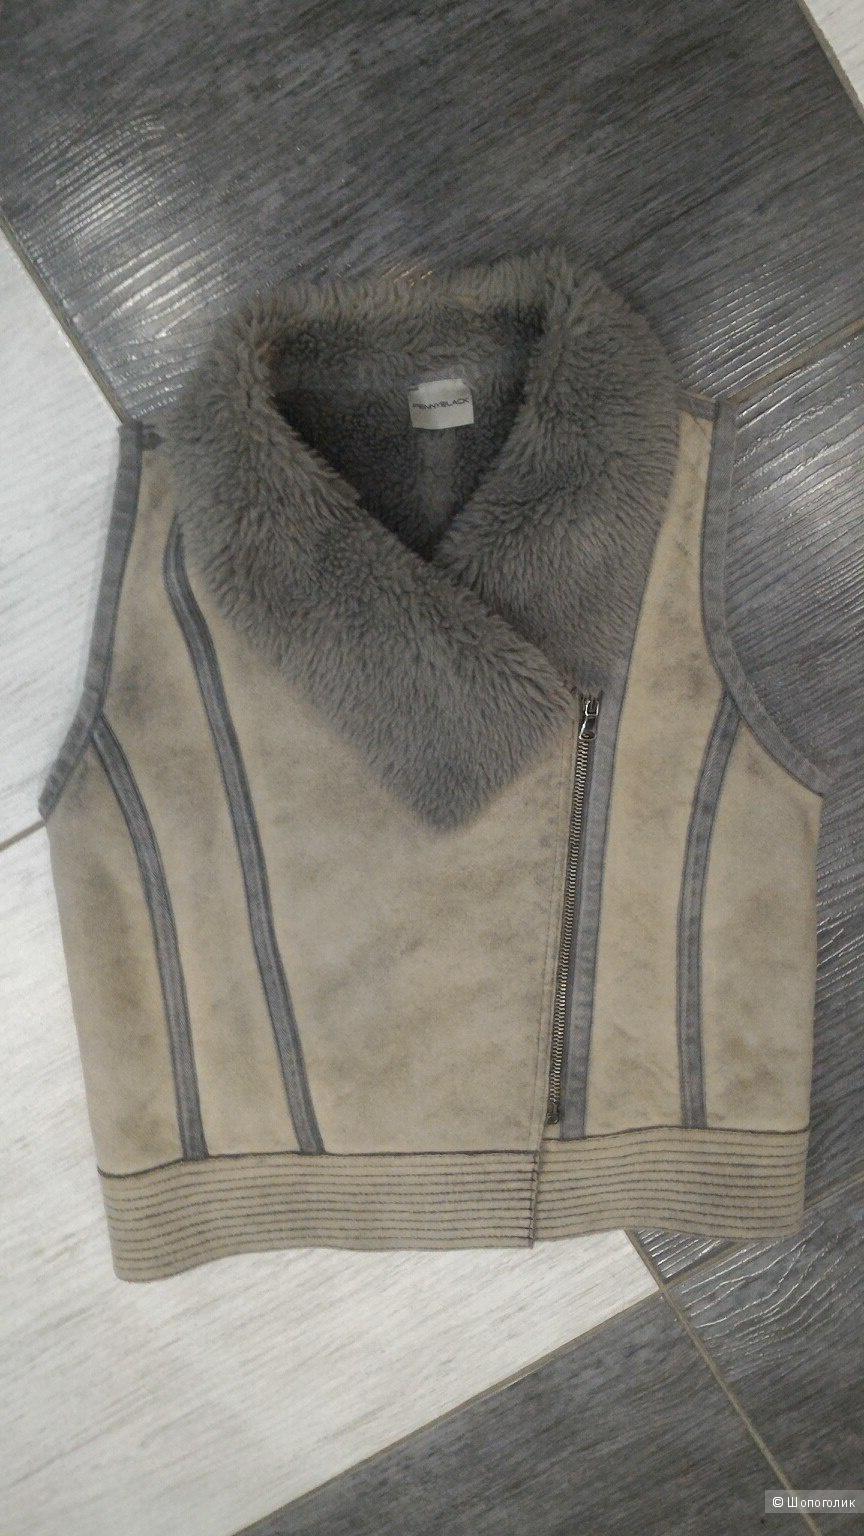 Теплый жилет Pennyblack, размер 6 USA